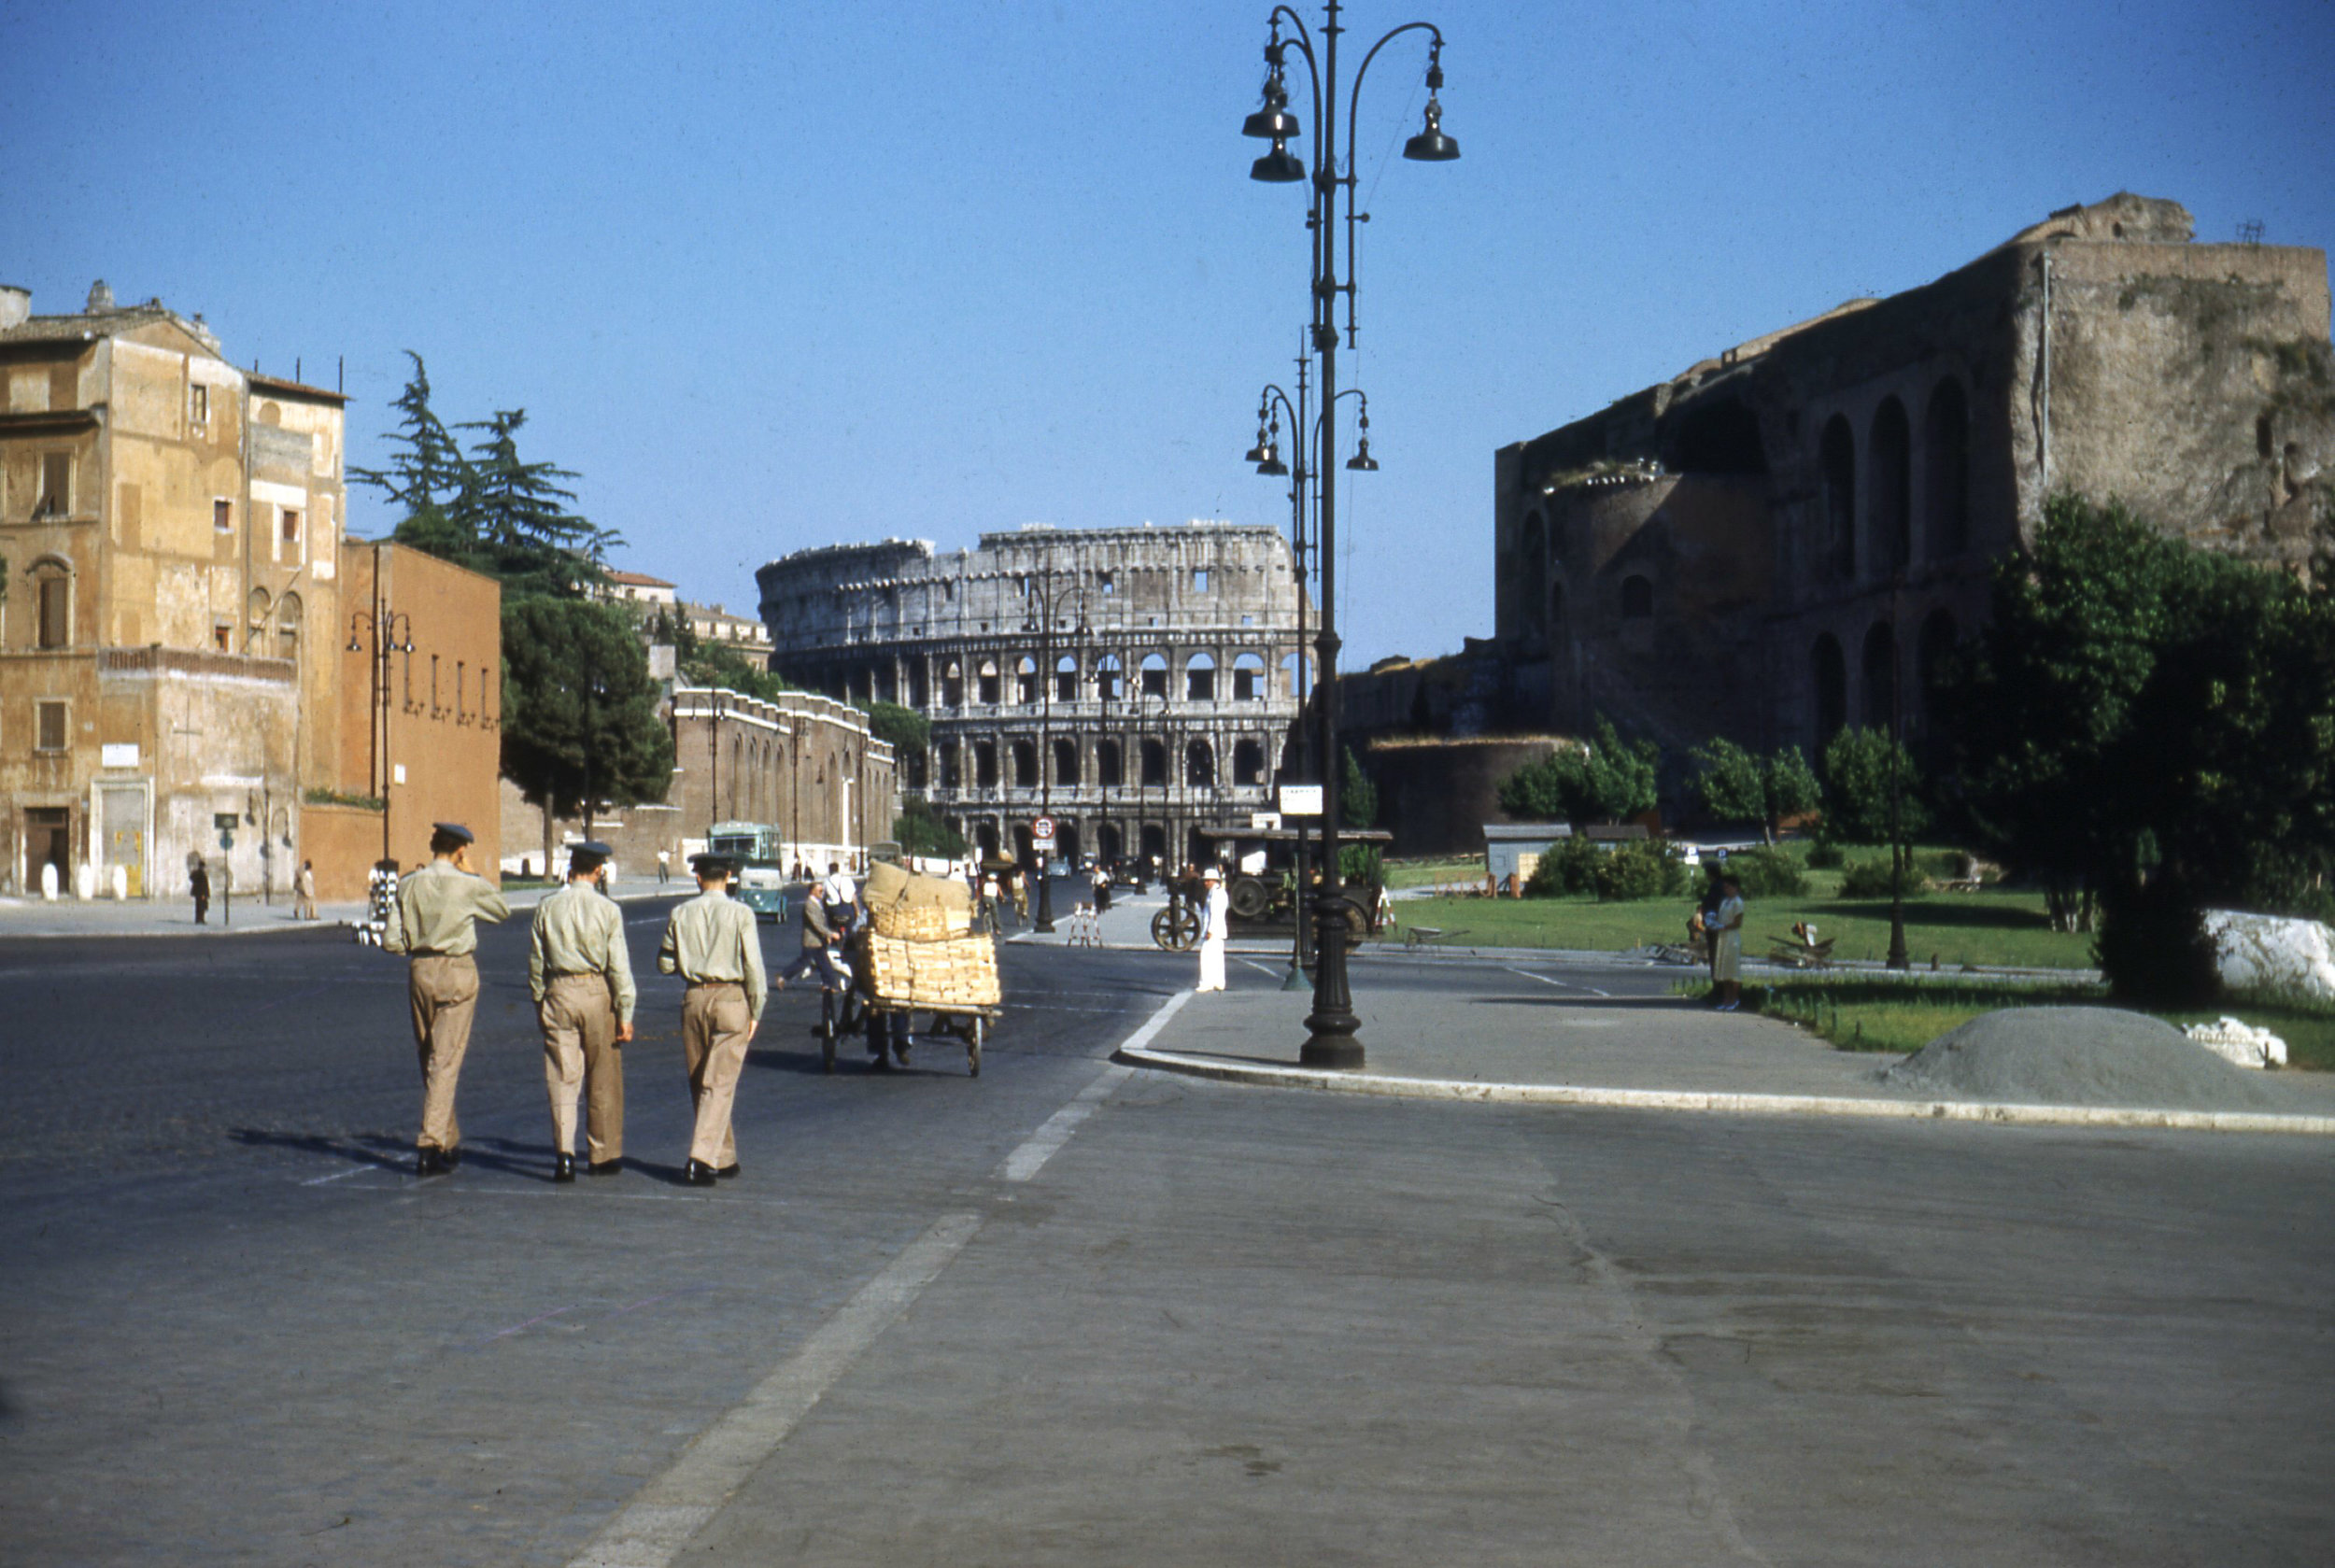 Streets_of_Rome.jpg